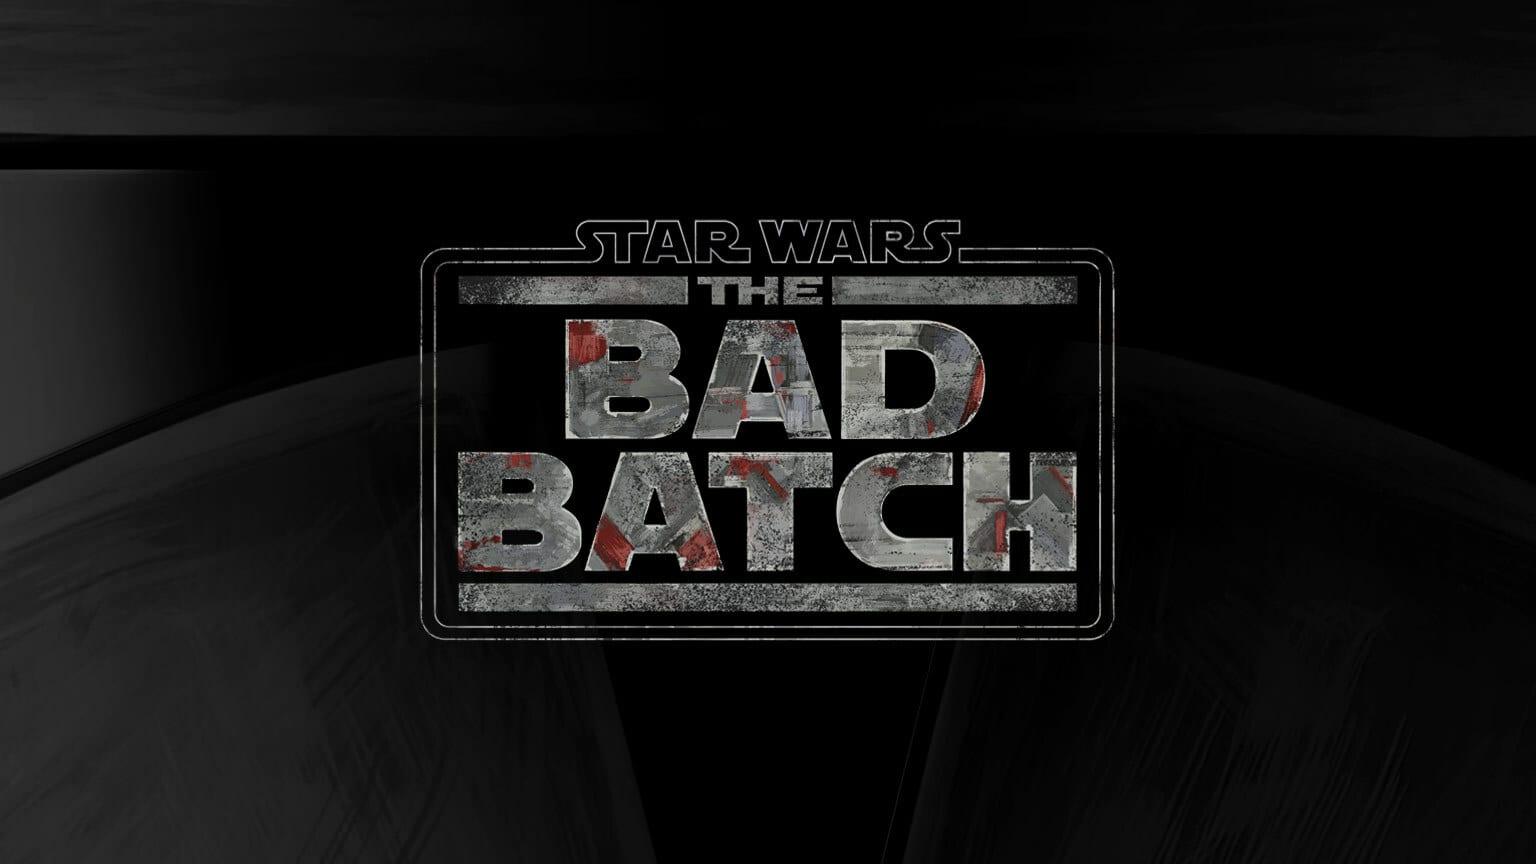 Star Wars The Bad Batch, premiers on Disney Plus in 2021